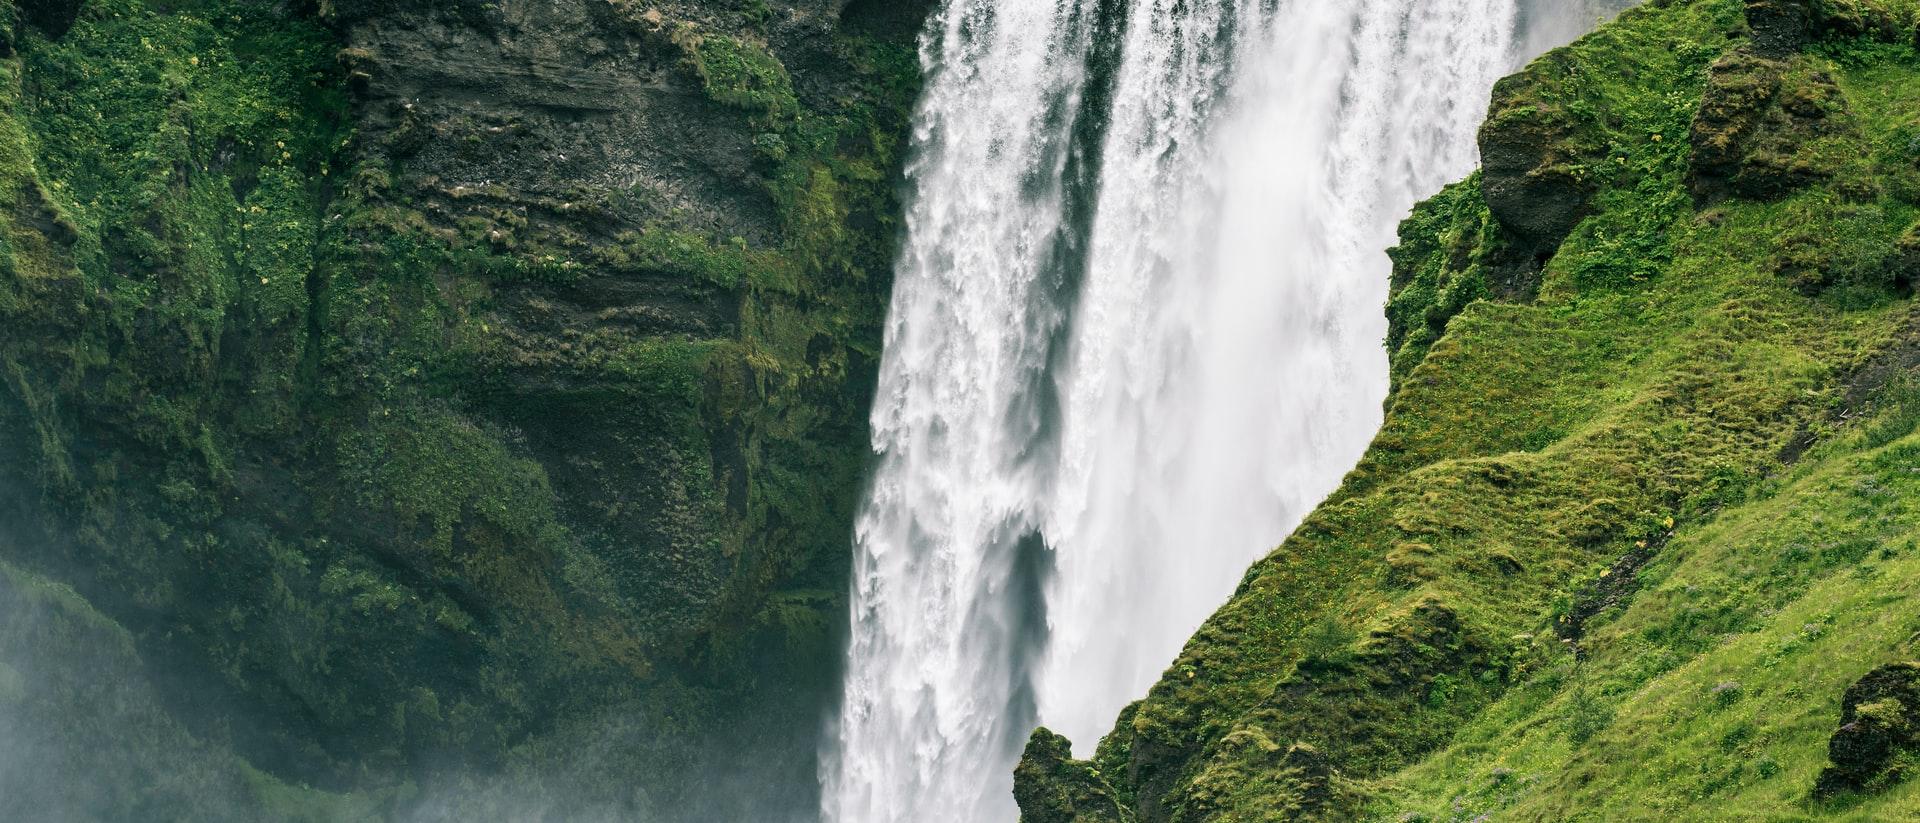 Avontuur in IJsland - Skogafoss waterval